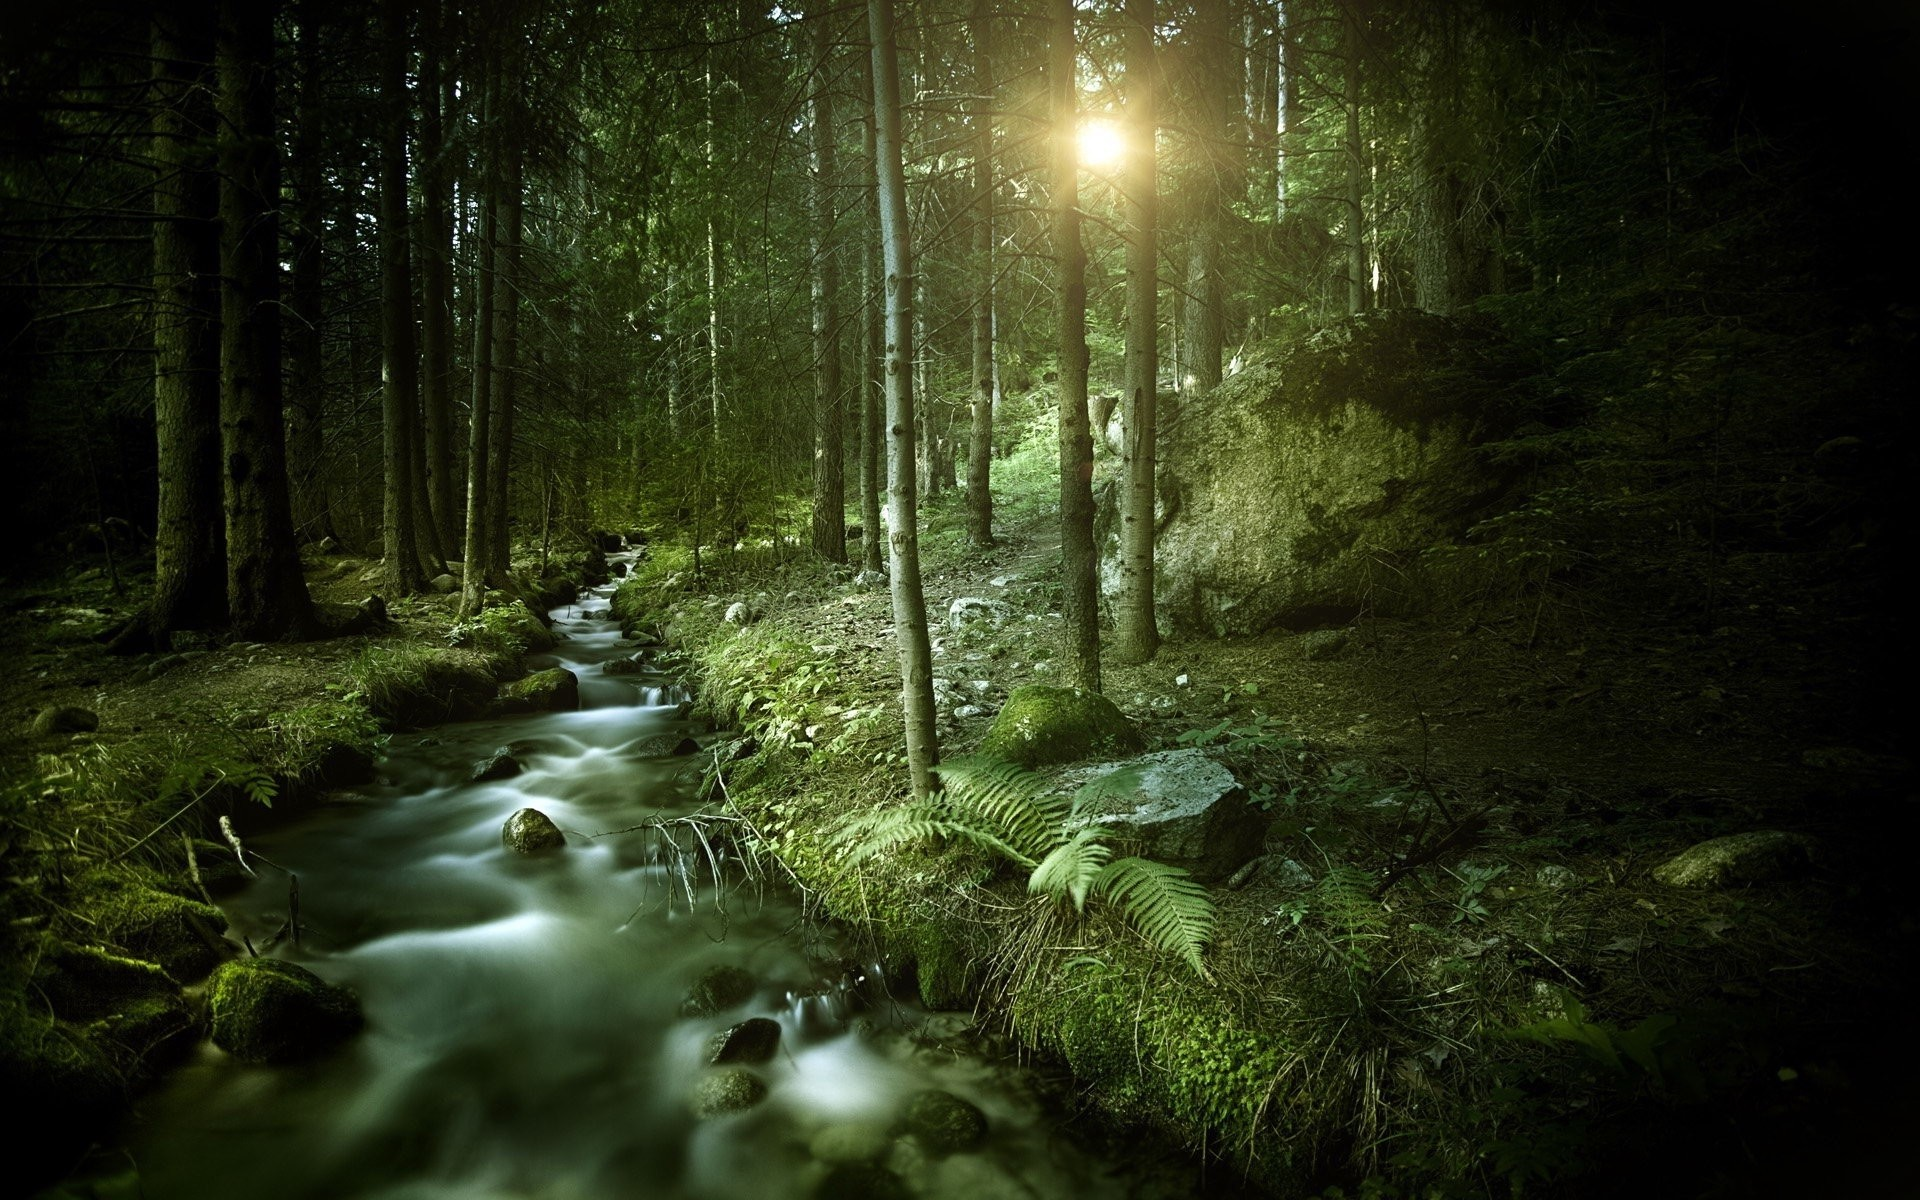 DArk Forest HD Wallpapers : Find best latest Dark Forest HD Wallpapers for  your PC desktop